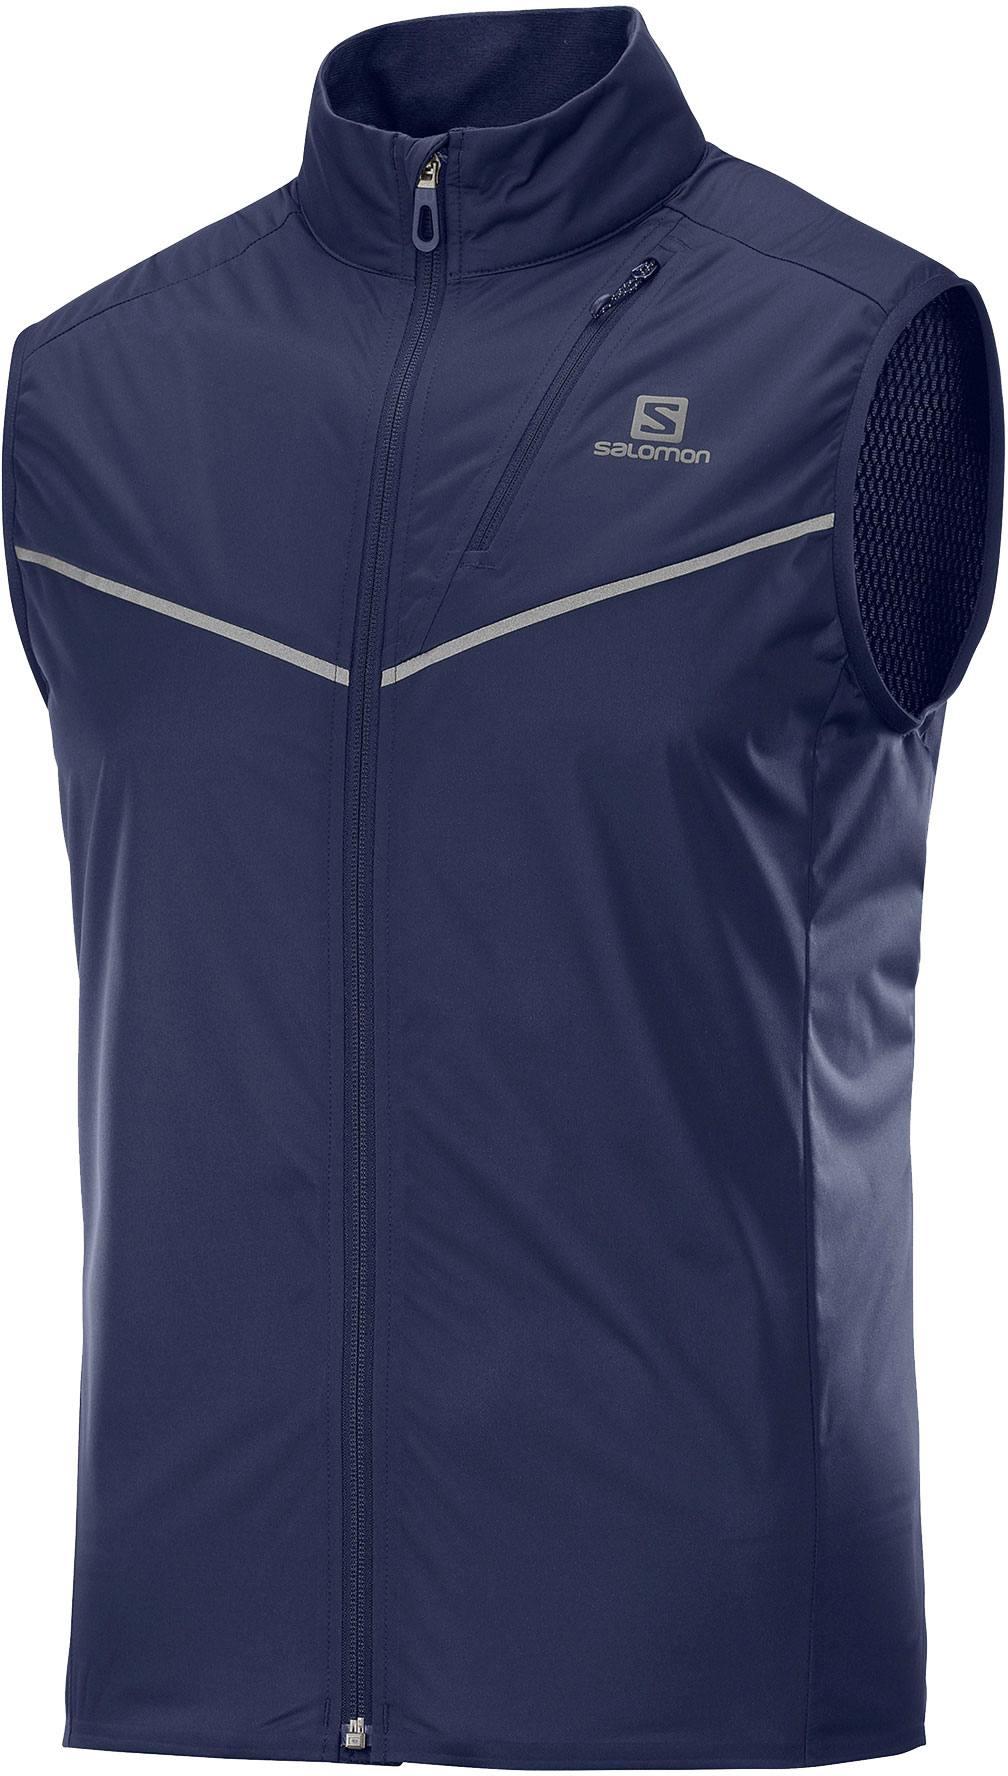 Salomon RS Light Vest Men's Night blue S